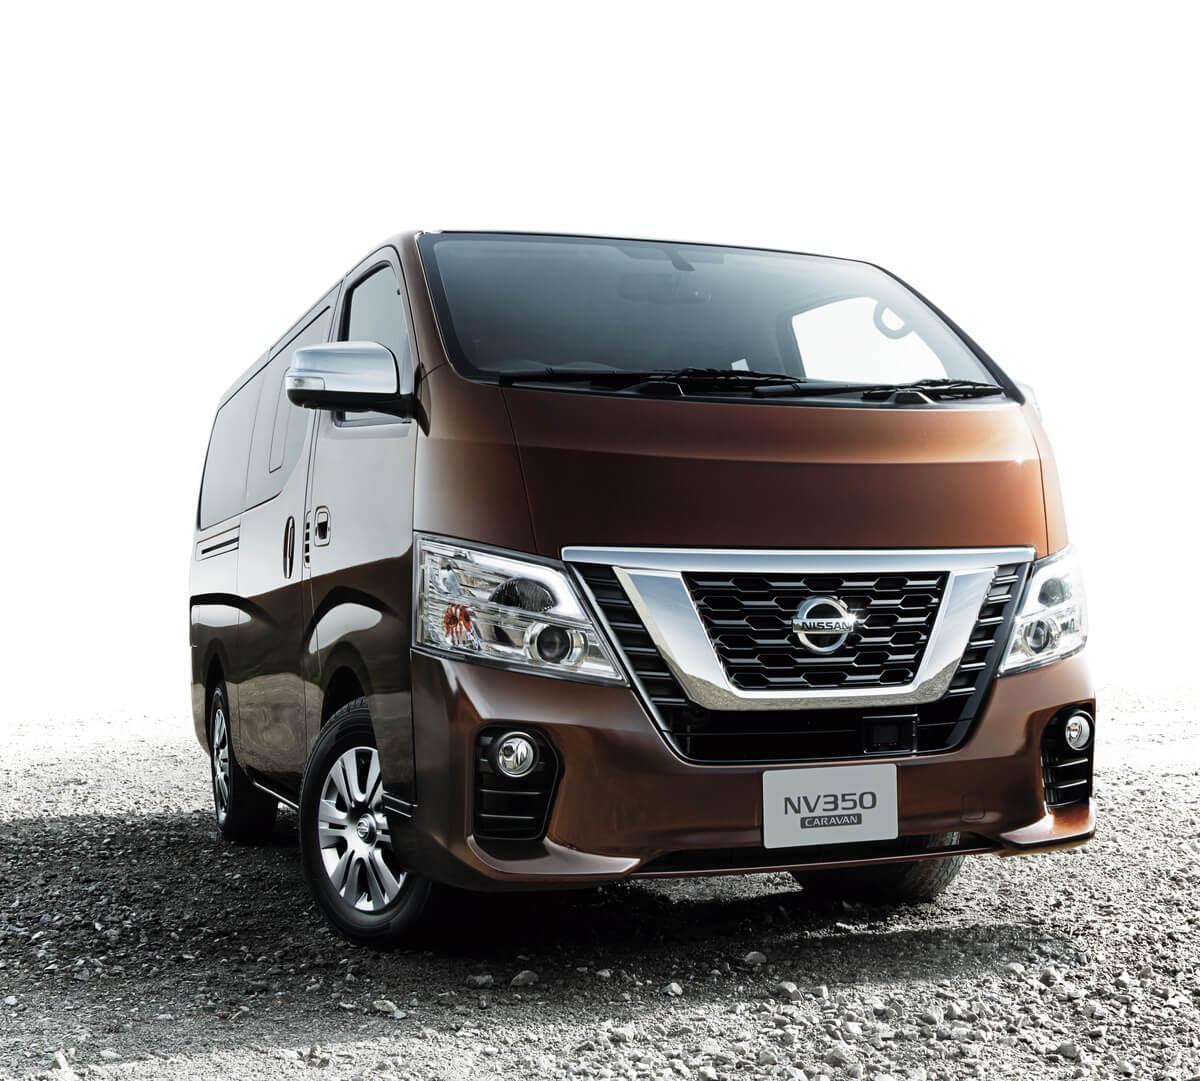 Nissan_Caravan_CBF-VR2E26_front